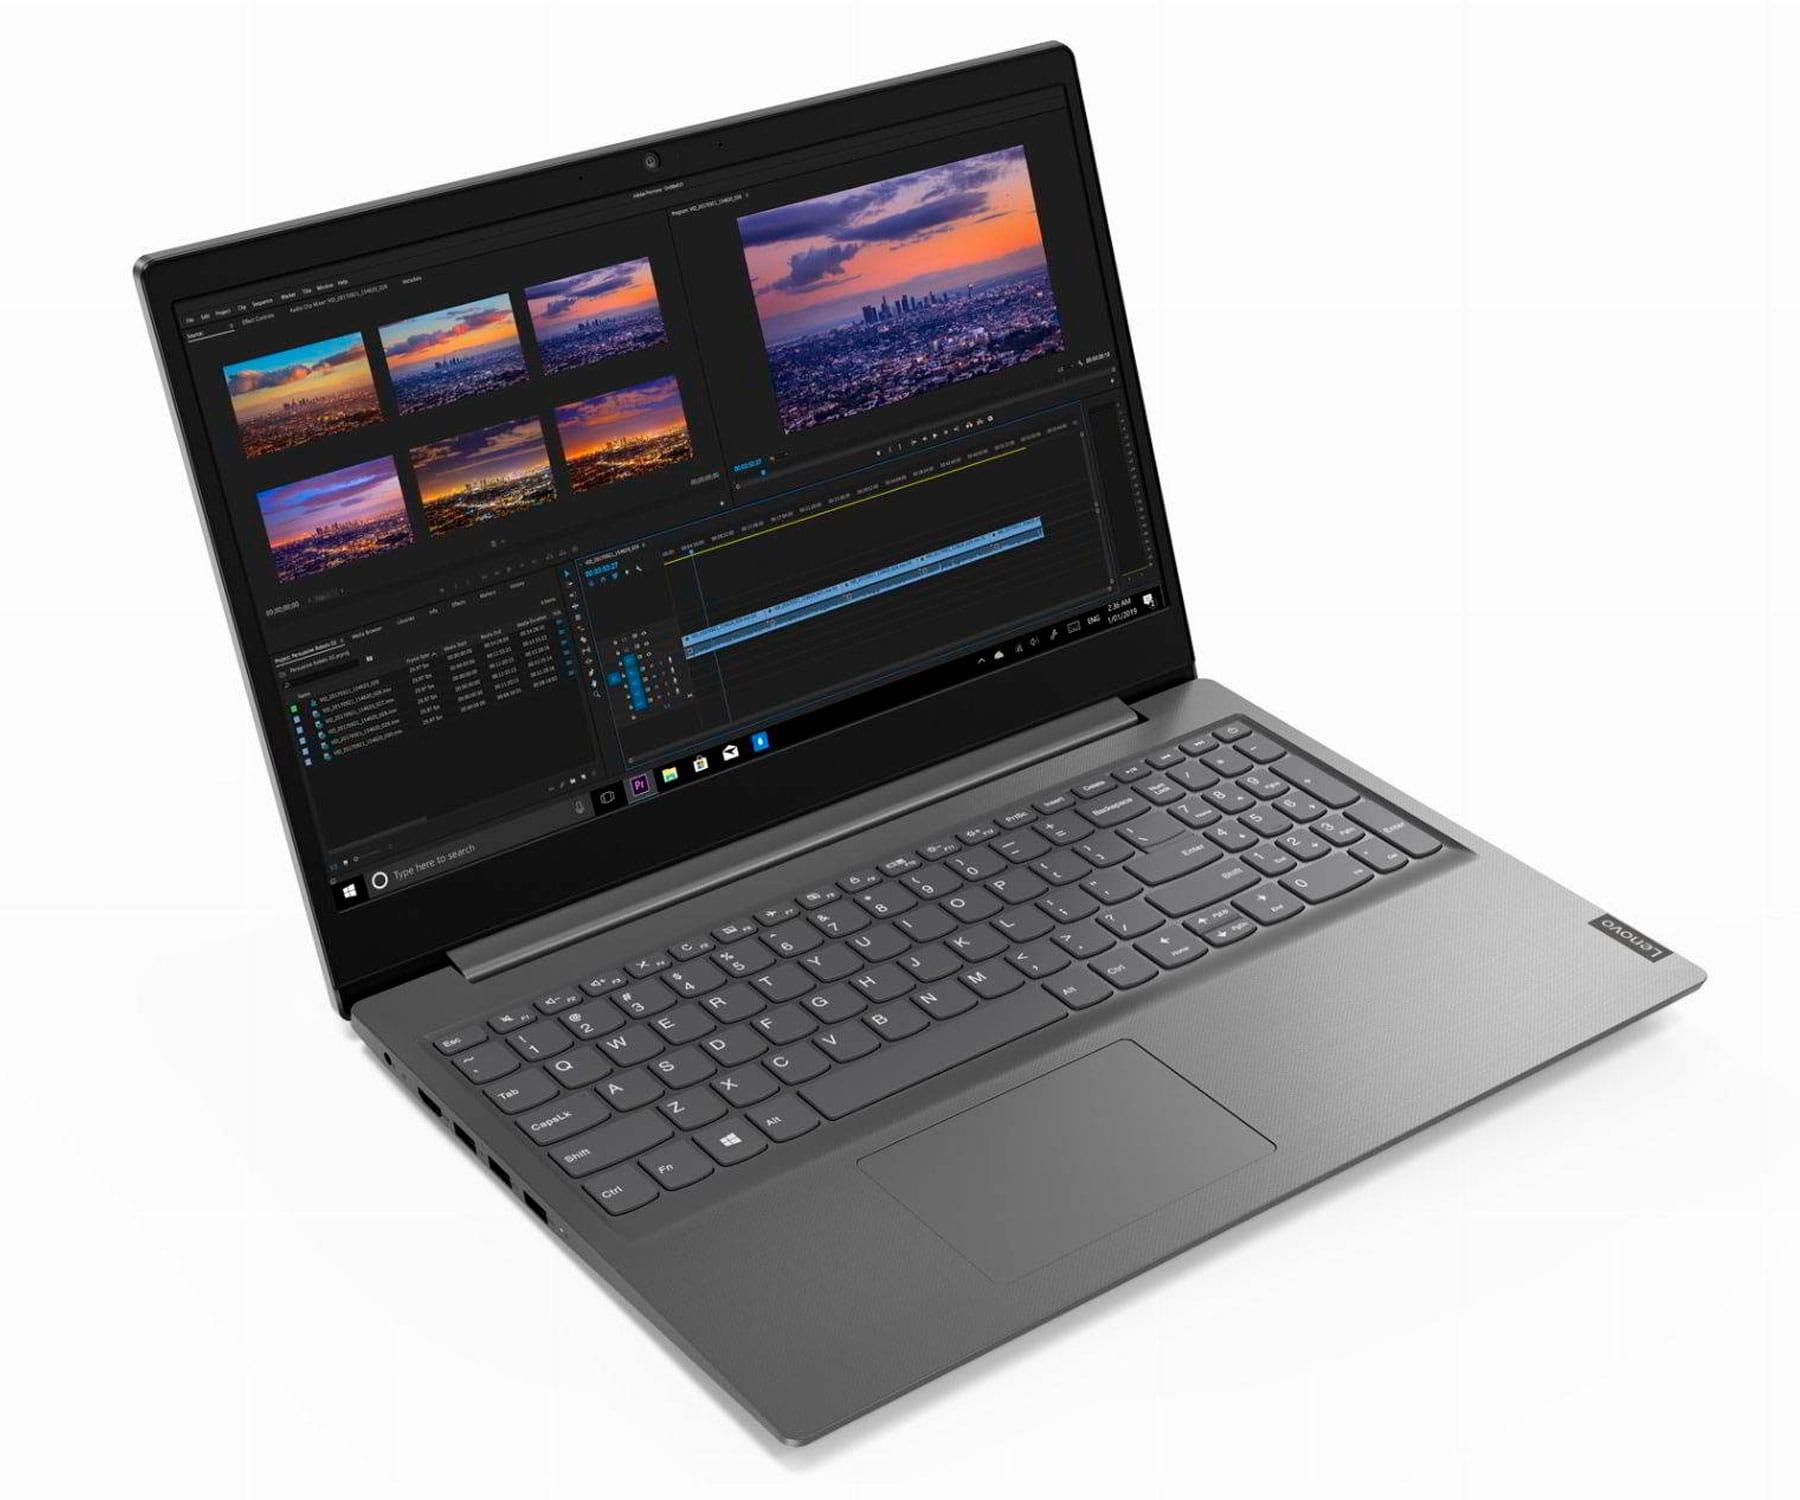 LENOVO V15-IIL GRIS PORTÁTIL 15.6'' LCD LED HDi5-1035G1 256GB SSD M2 8GB RAM FREEDOS